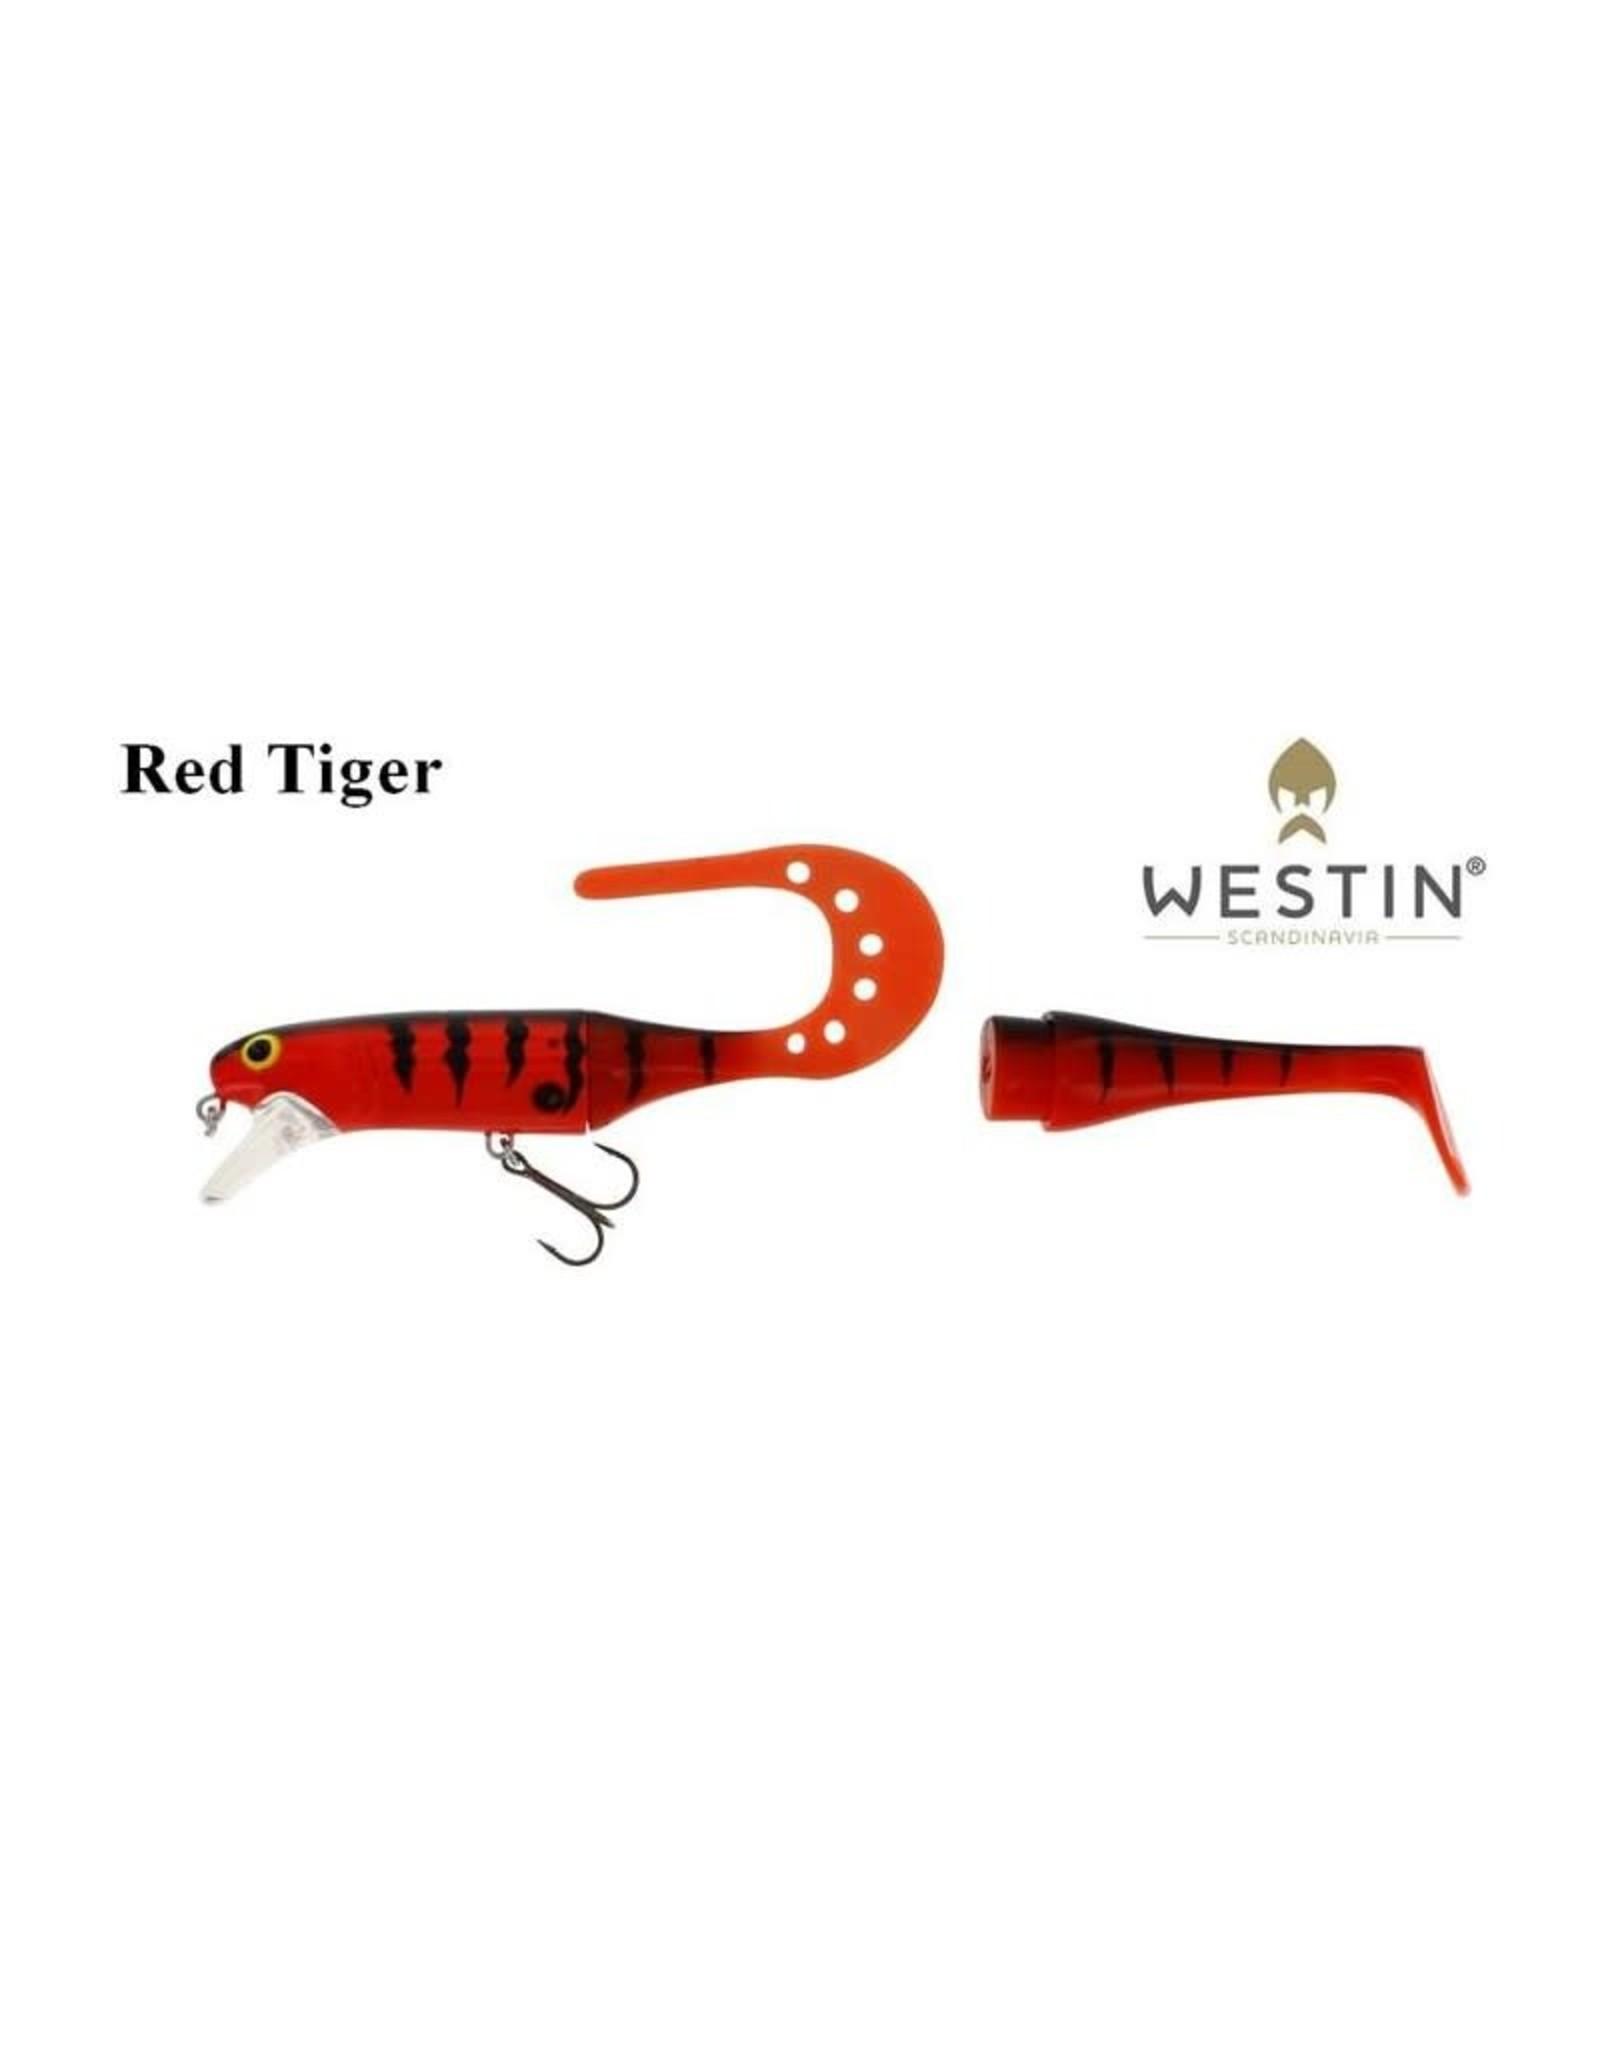 Westin Westin JÄTTE Teeztail 140mm 29G Floating Red TIGER